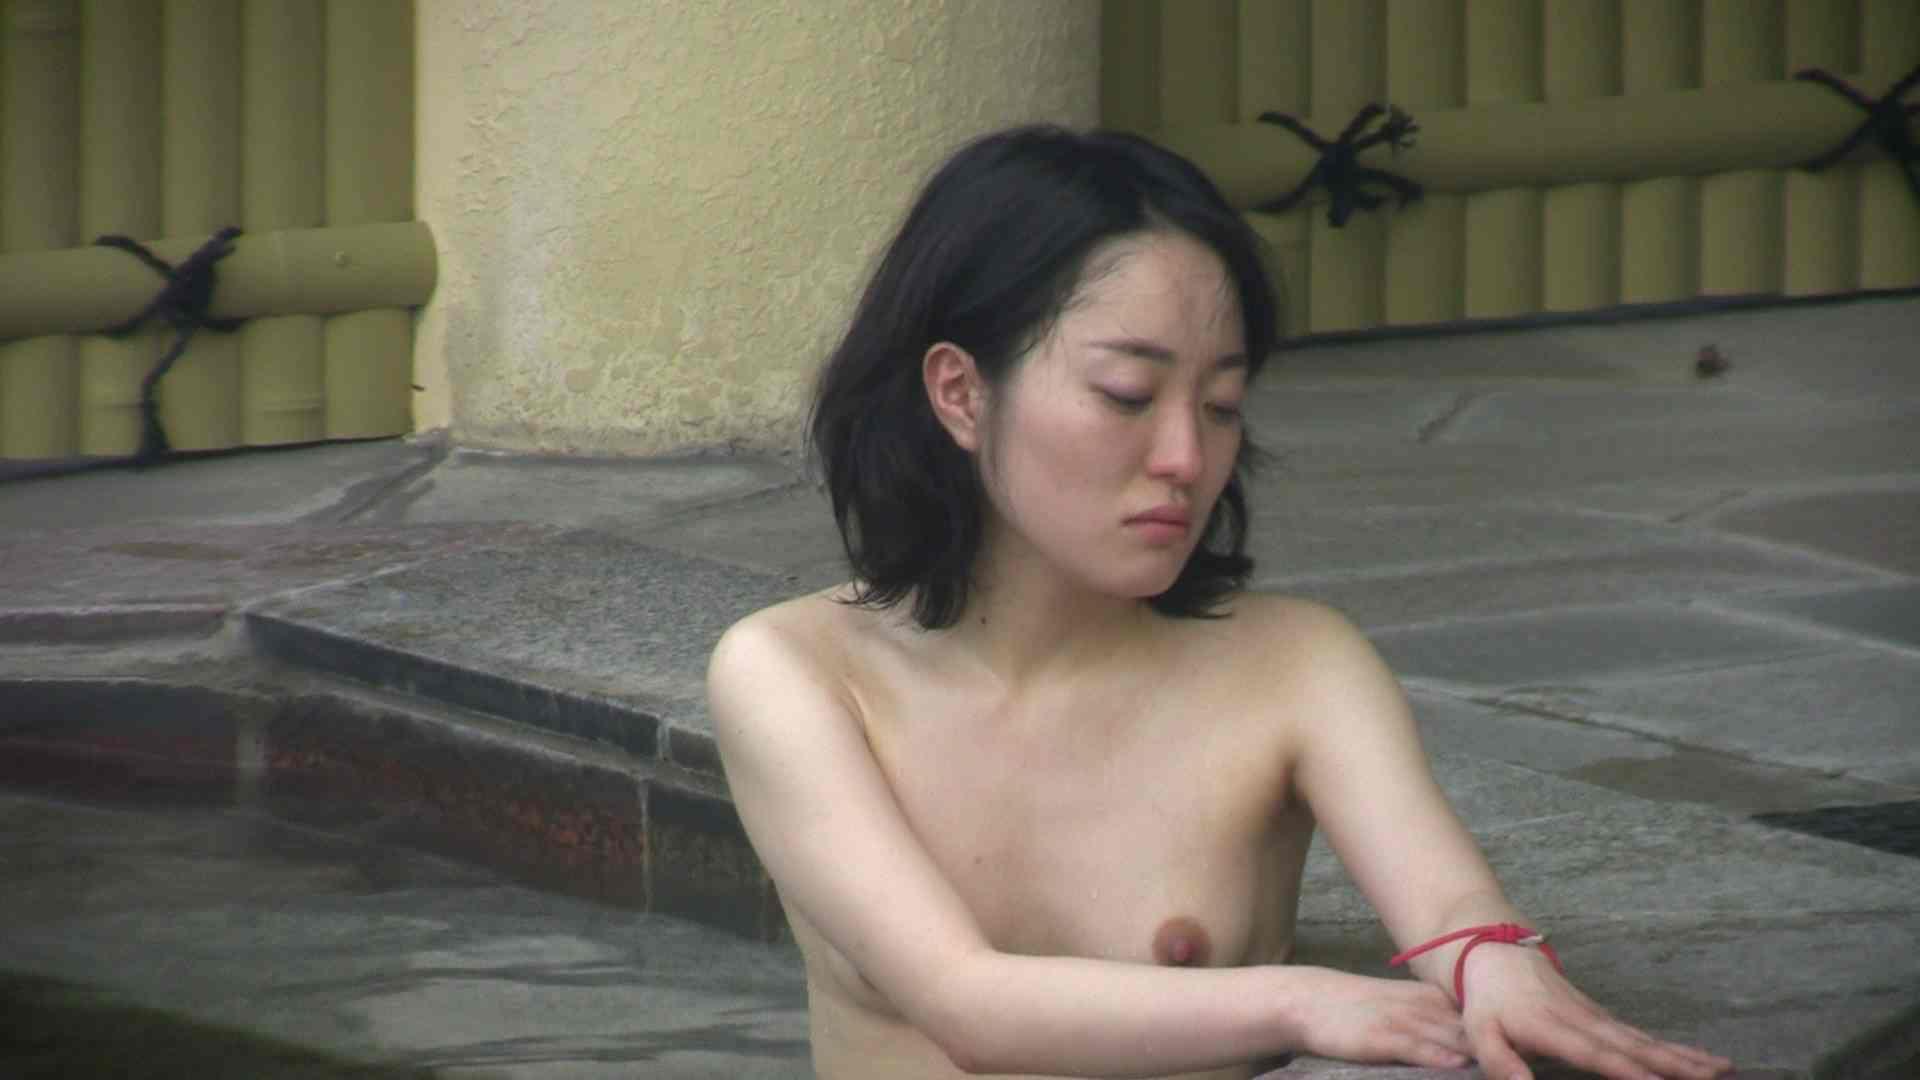 Aquaな露天風呂Vol.681 盗撮シリーズ   露天風呂編  94PIX 63